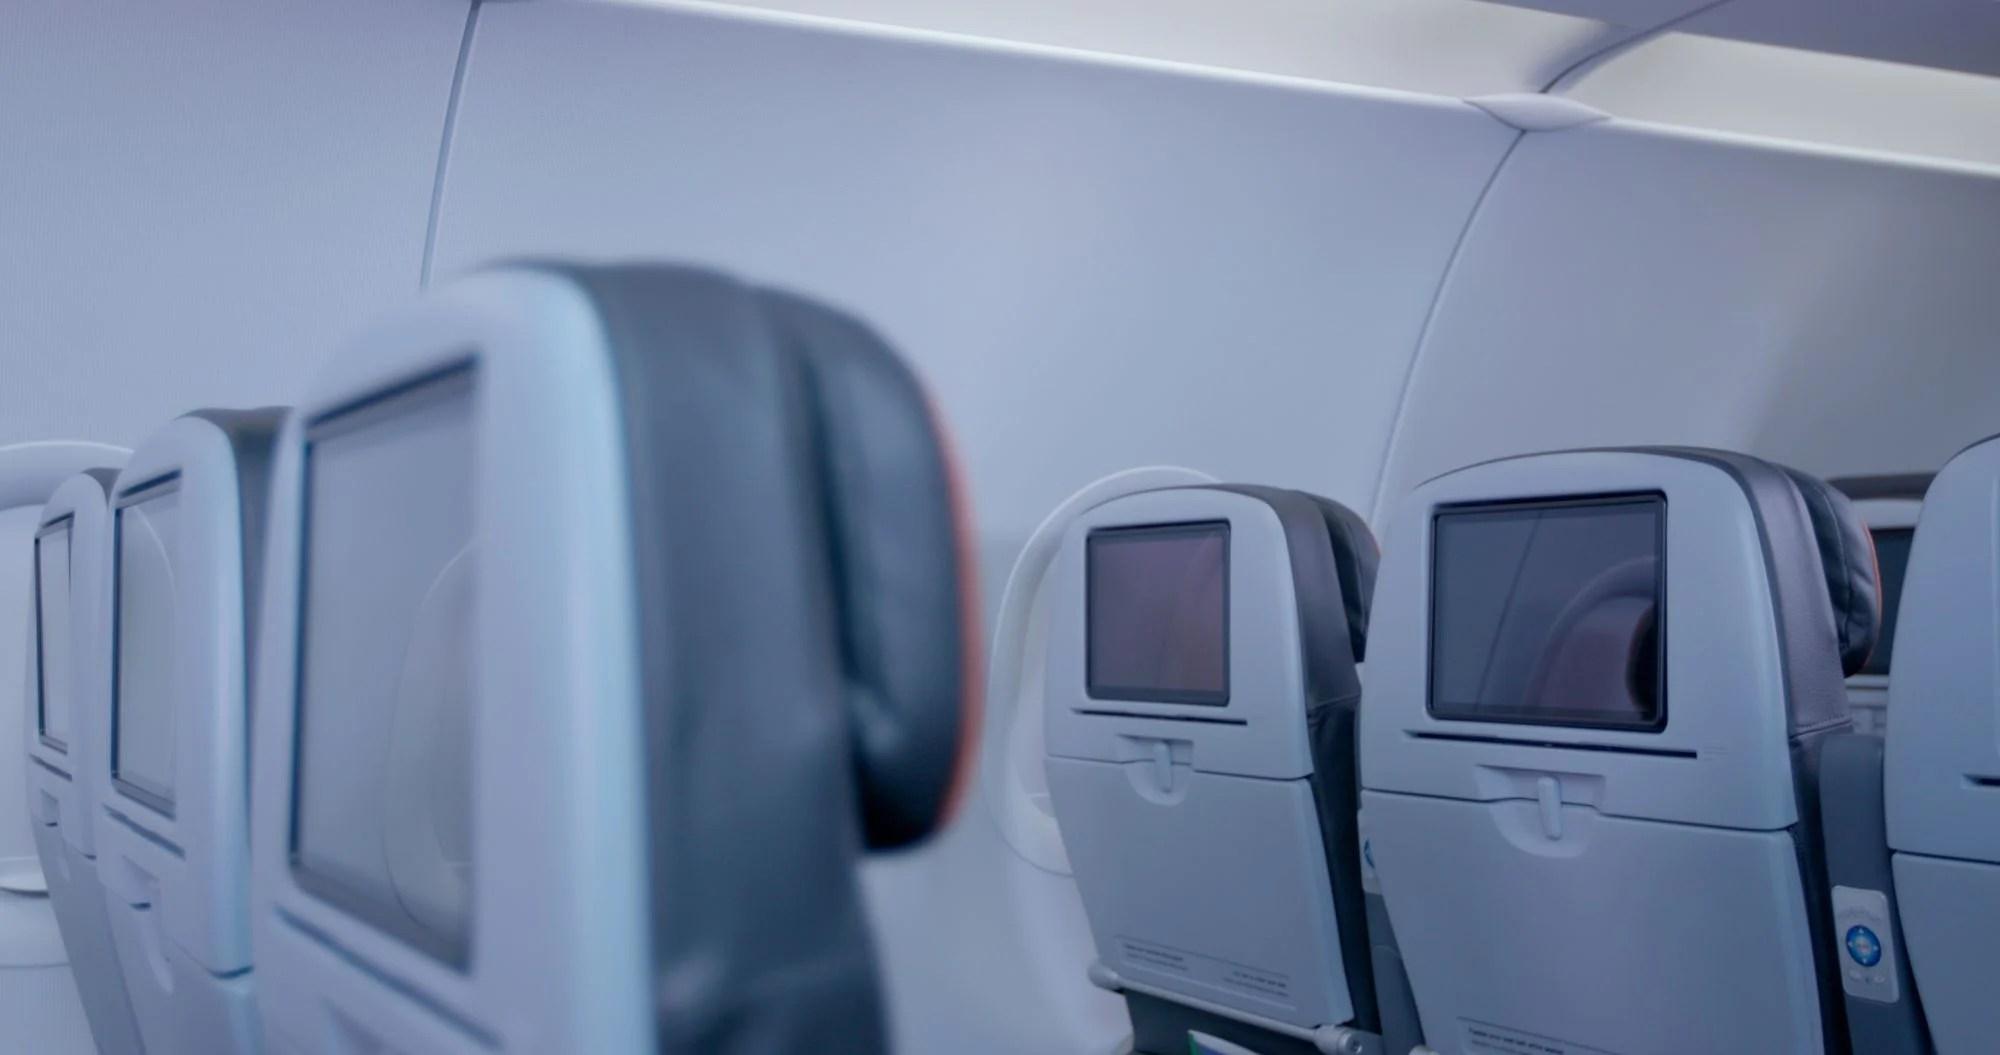 JetBlue va installer Android sur les écrans de ses AirbusA-320